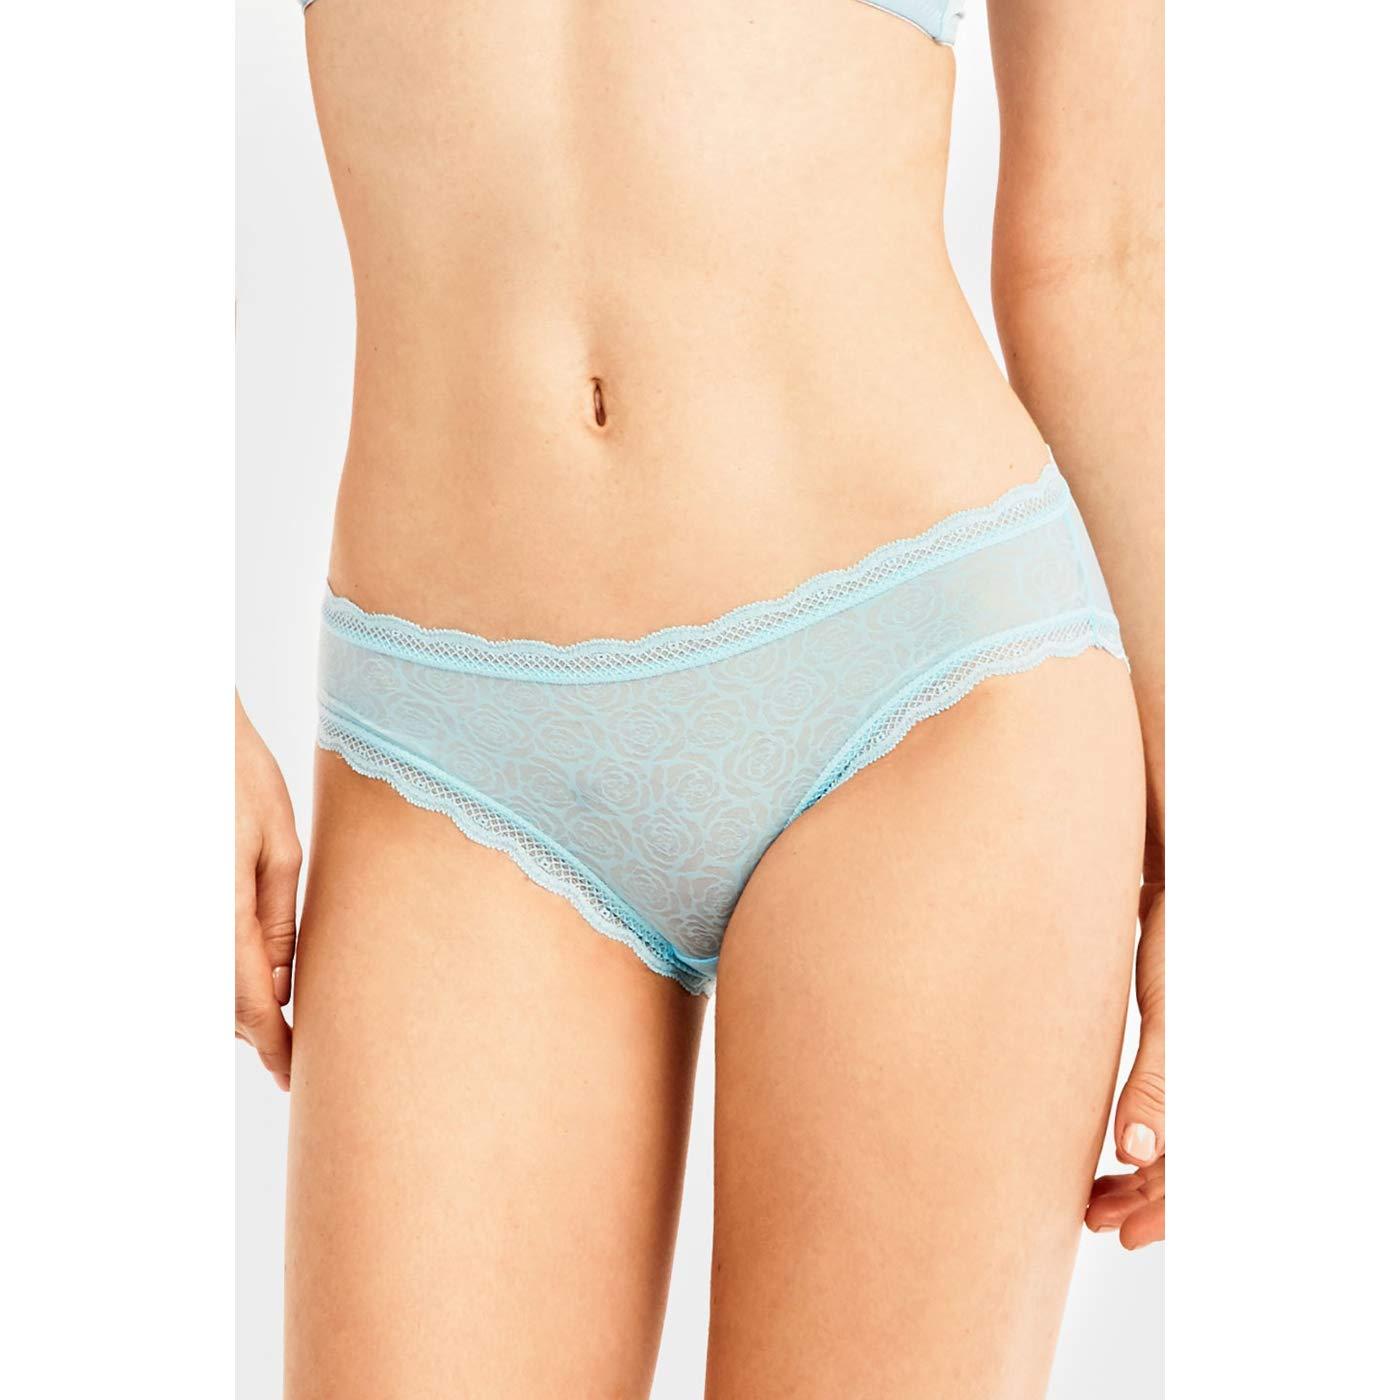 Uni Style Apparel Womens Lace Nylon Bikini Panties 12 Pack